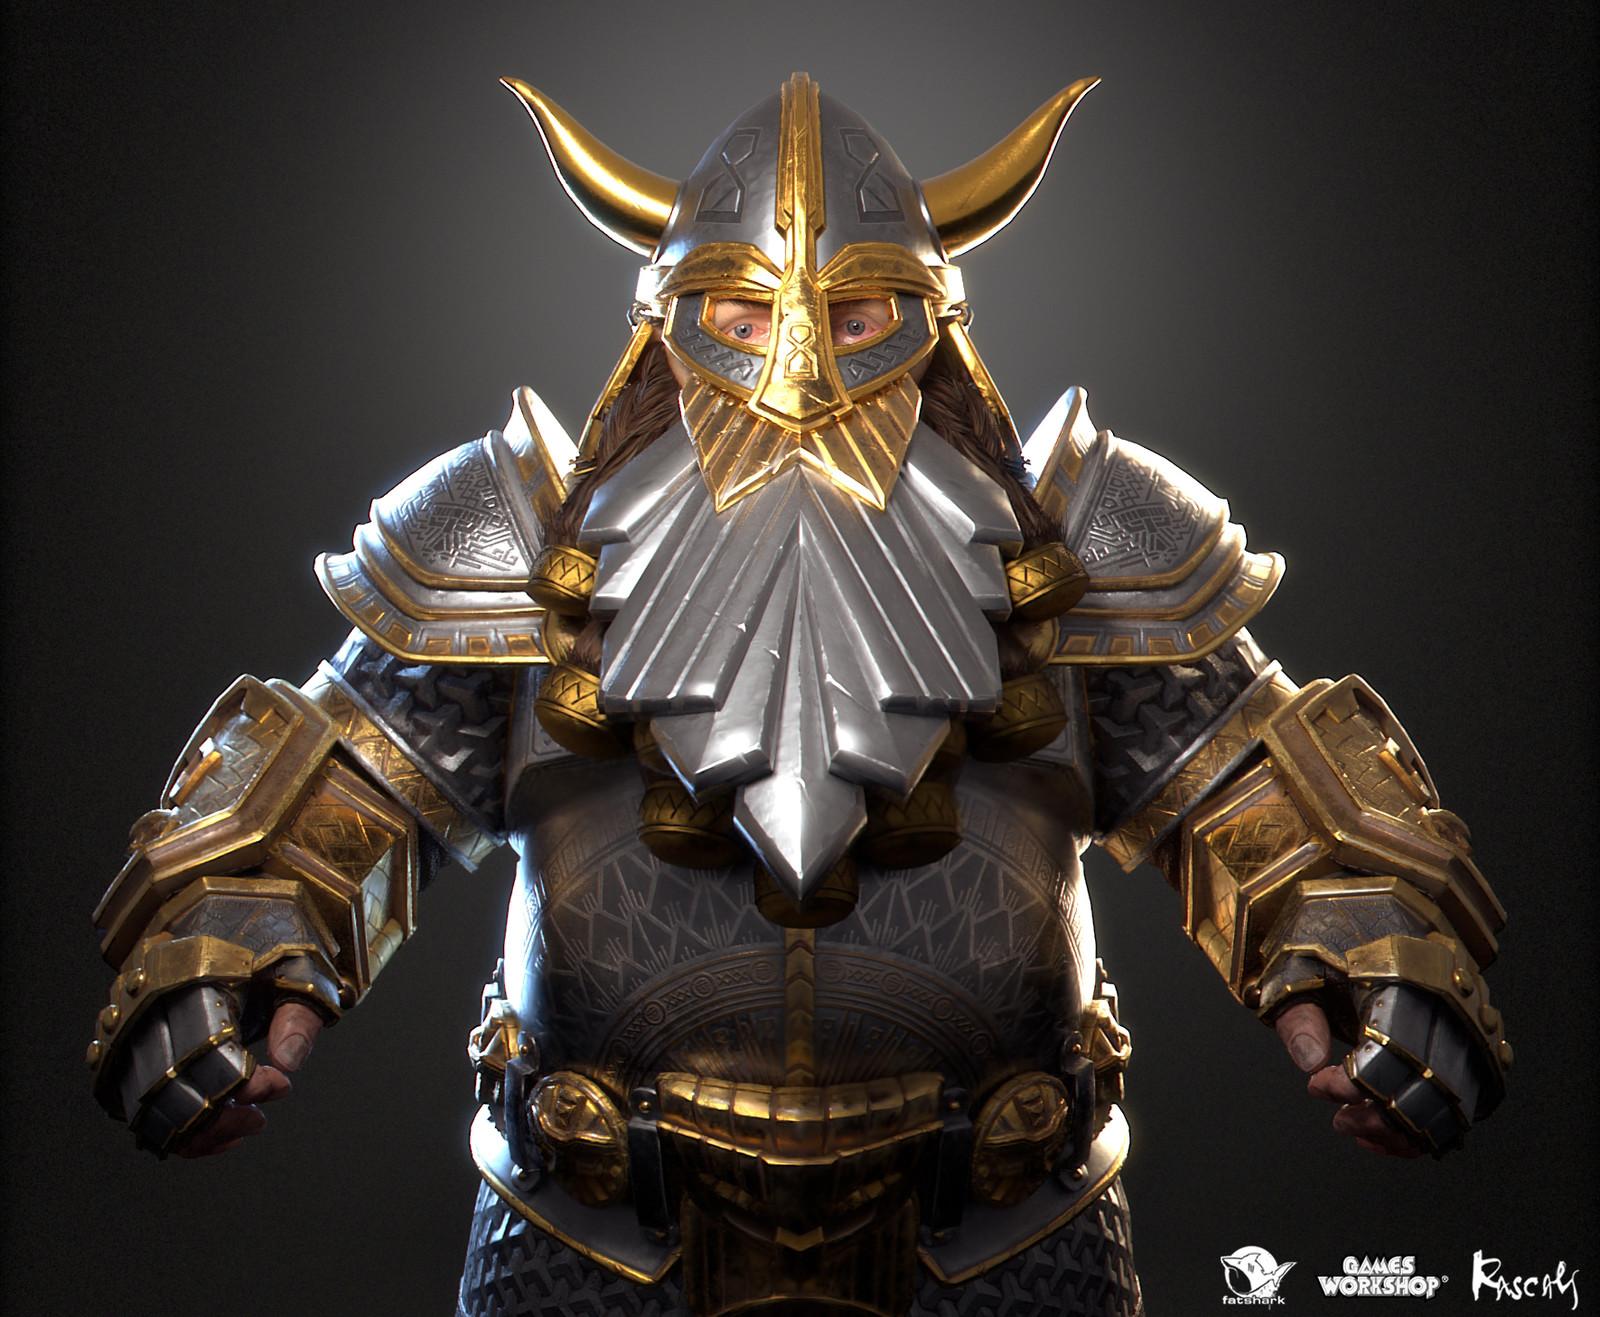 Bardin Goreksson: Ironbreaker is one of the playable hero variants Rascals made for Warhammer: Vermintide II, Fatshark's award-winning co-op meelee action published by Games Workshop.